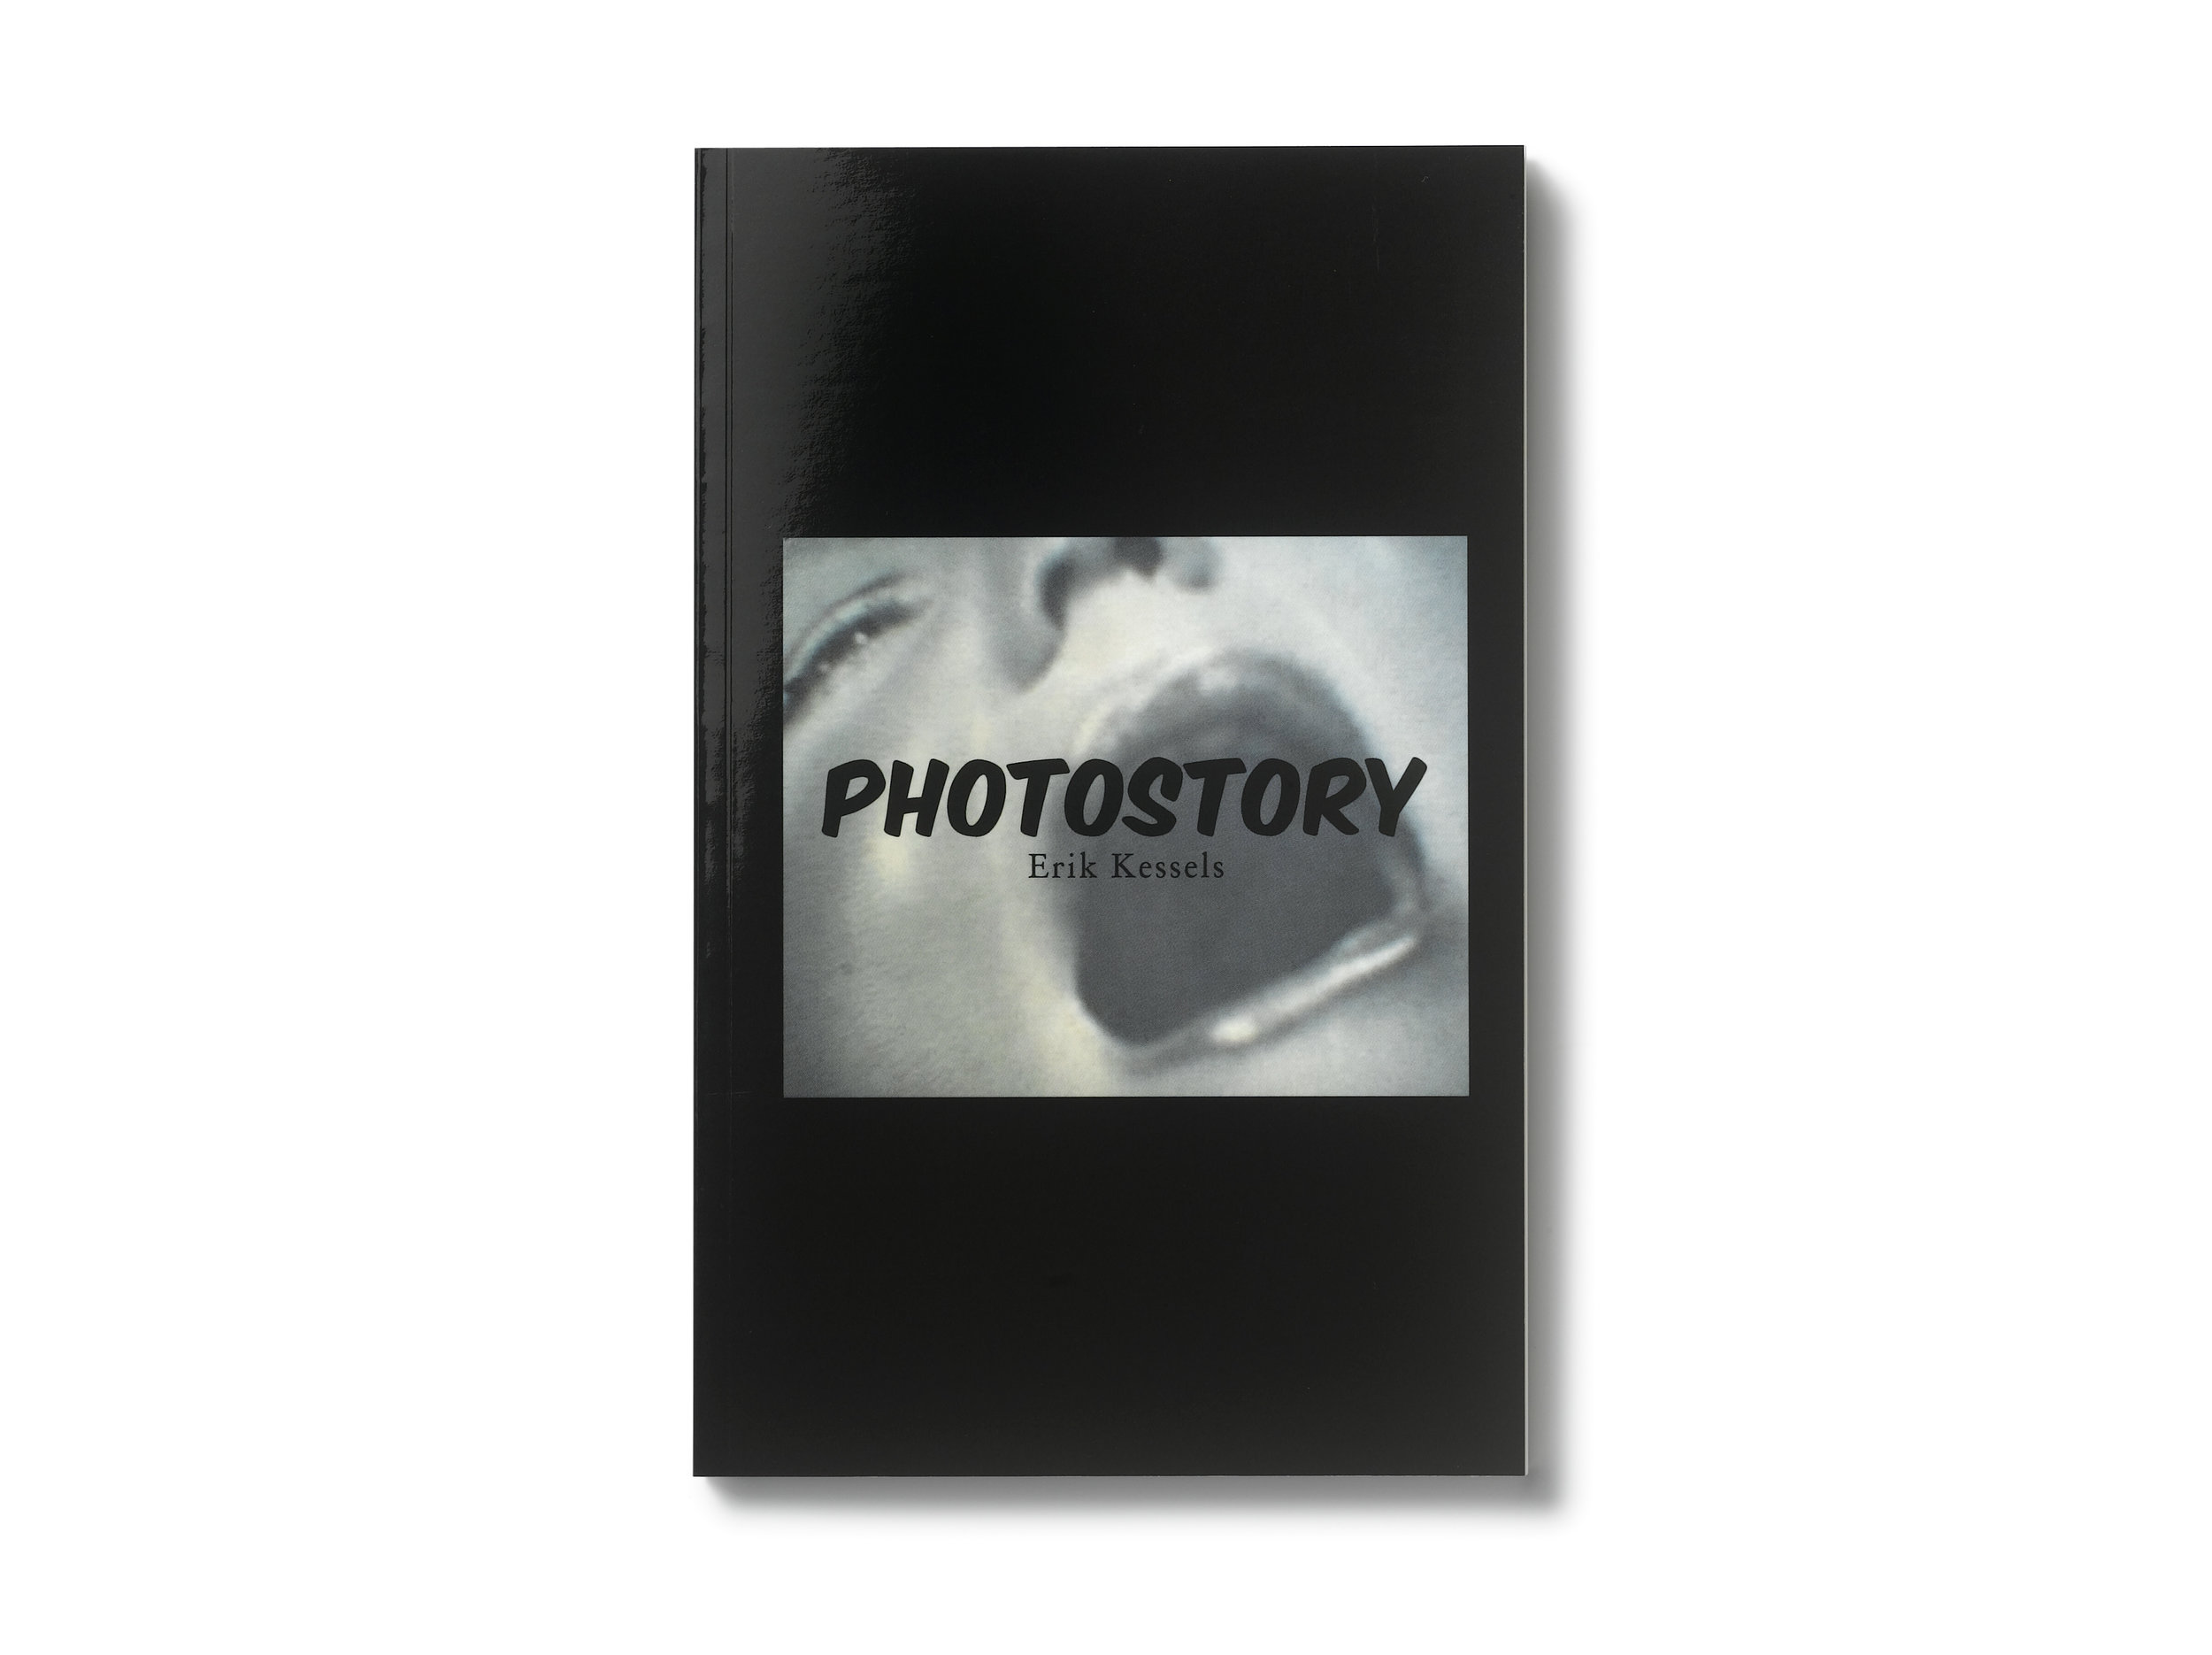 Cover Photostory copy.jpg